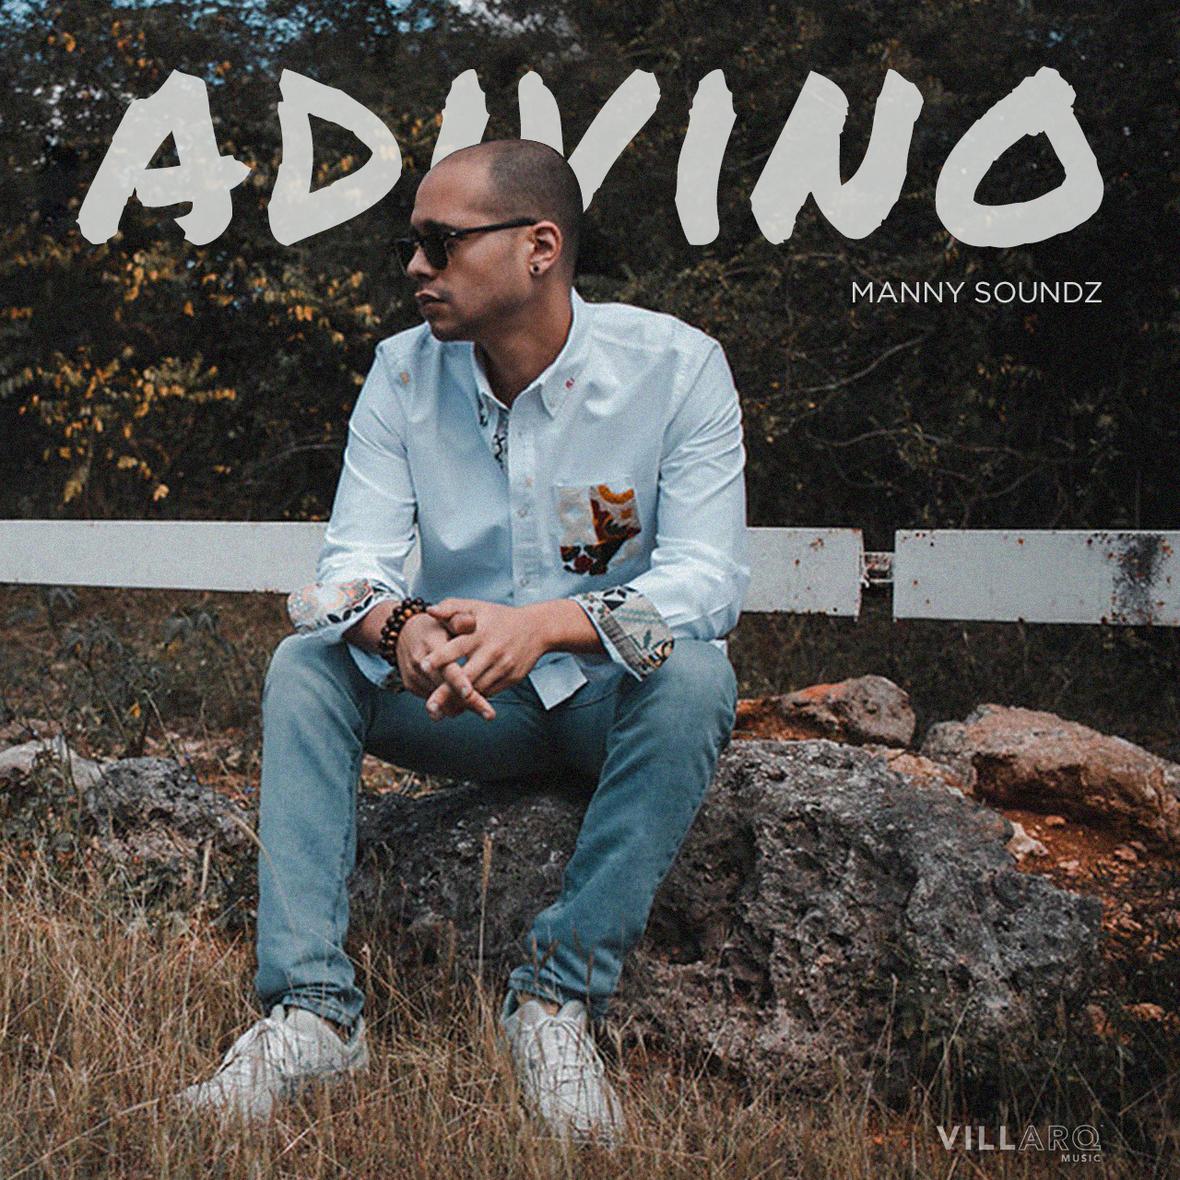 ADIVINO COVER 1280x1280px